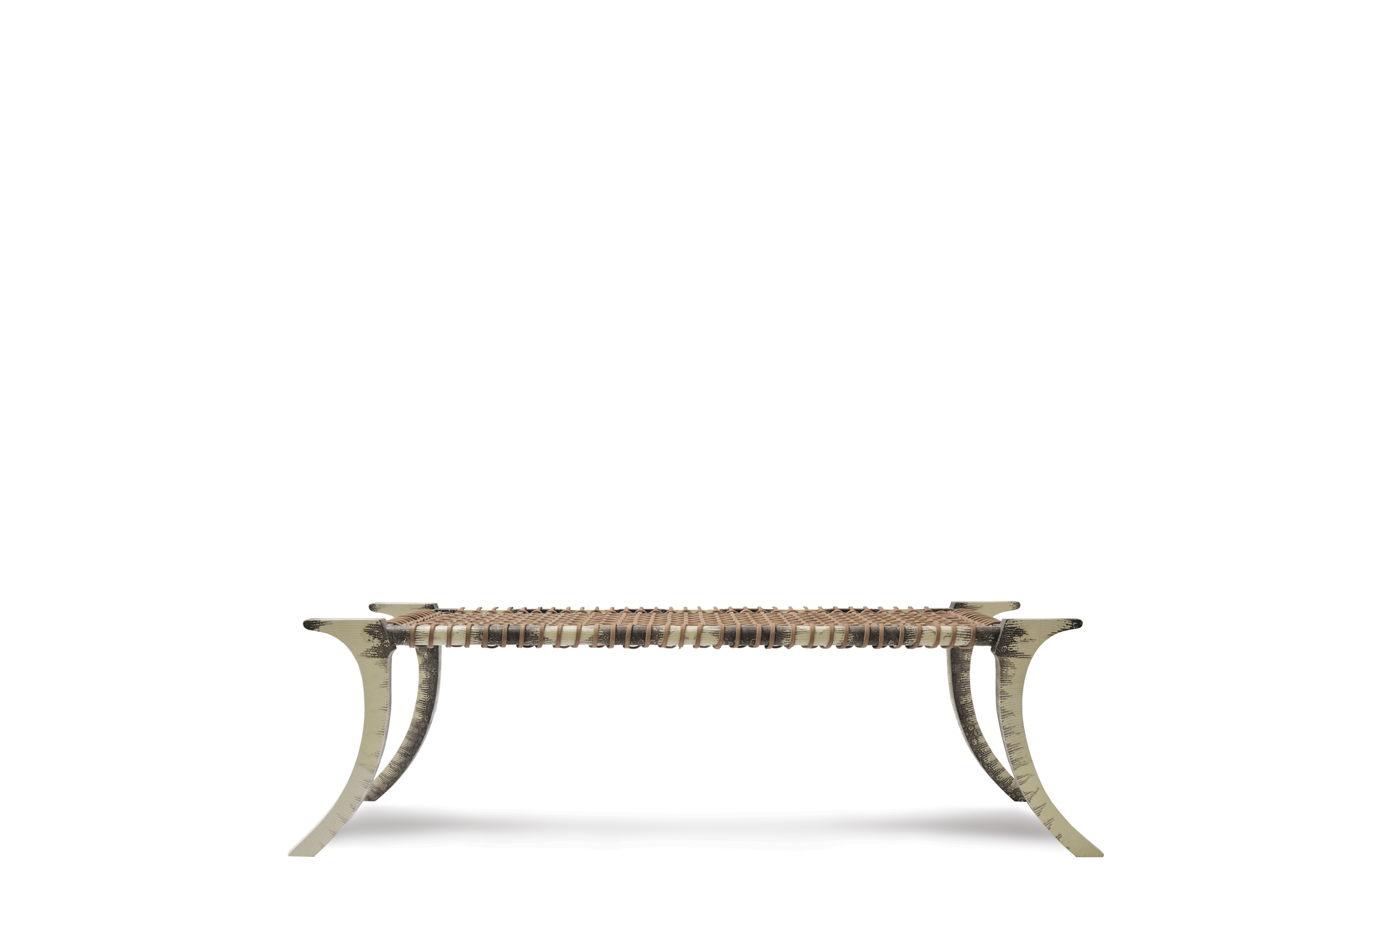 Awe Inspiring Klismos Bench Lizard Skin Scala Luxury Andrewgaddart Wooden Chair Designs For Living Room Andrewgaddartcom